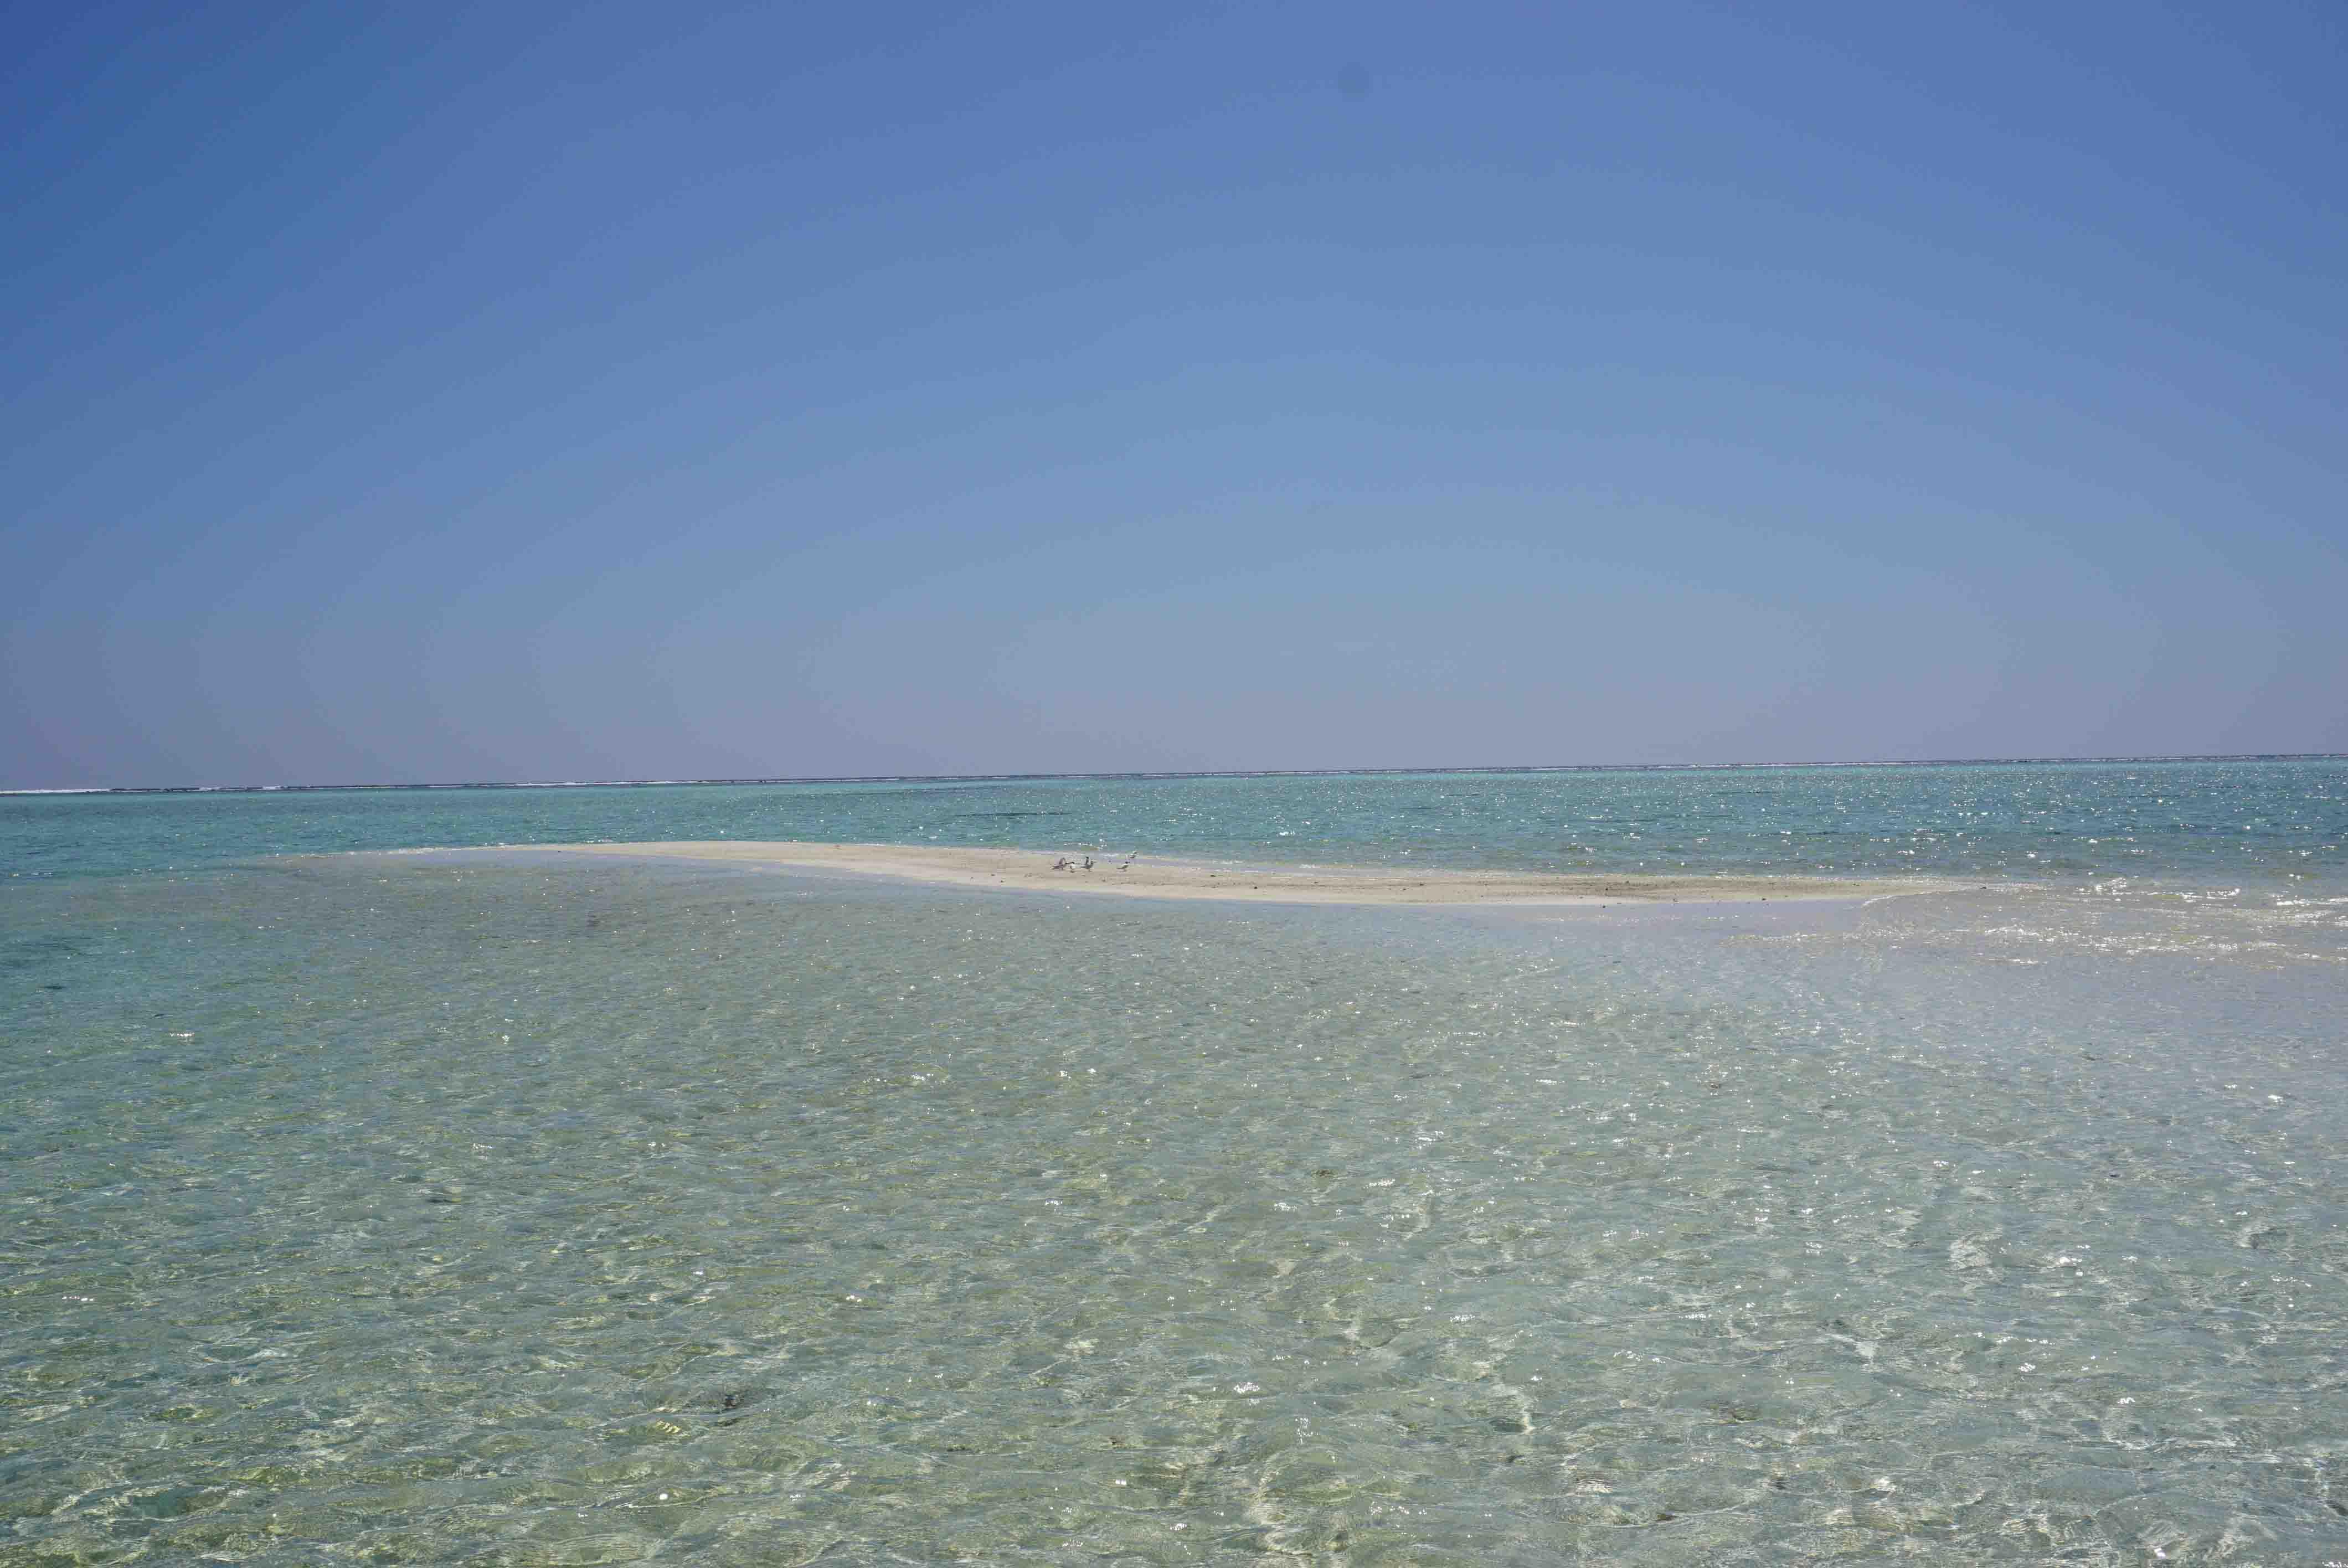 Relax in Maldives ep 2: The Half Day Sandbank Fun in Maldives